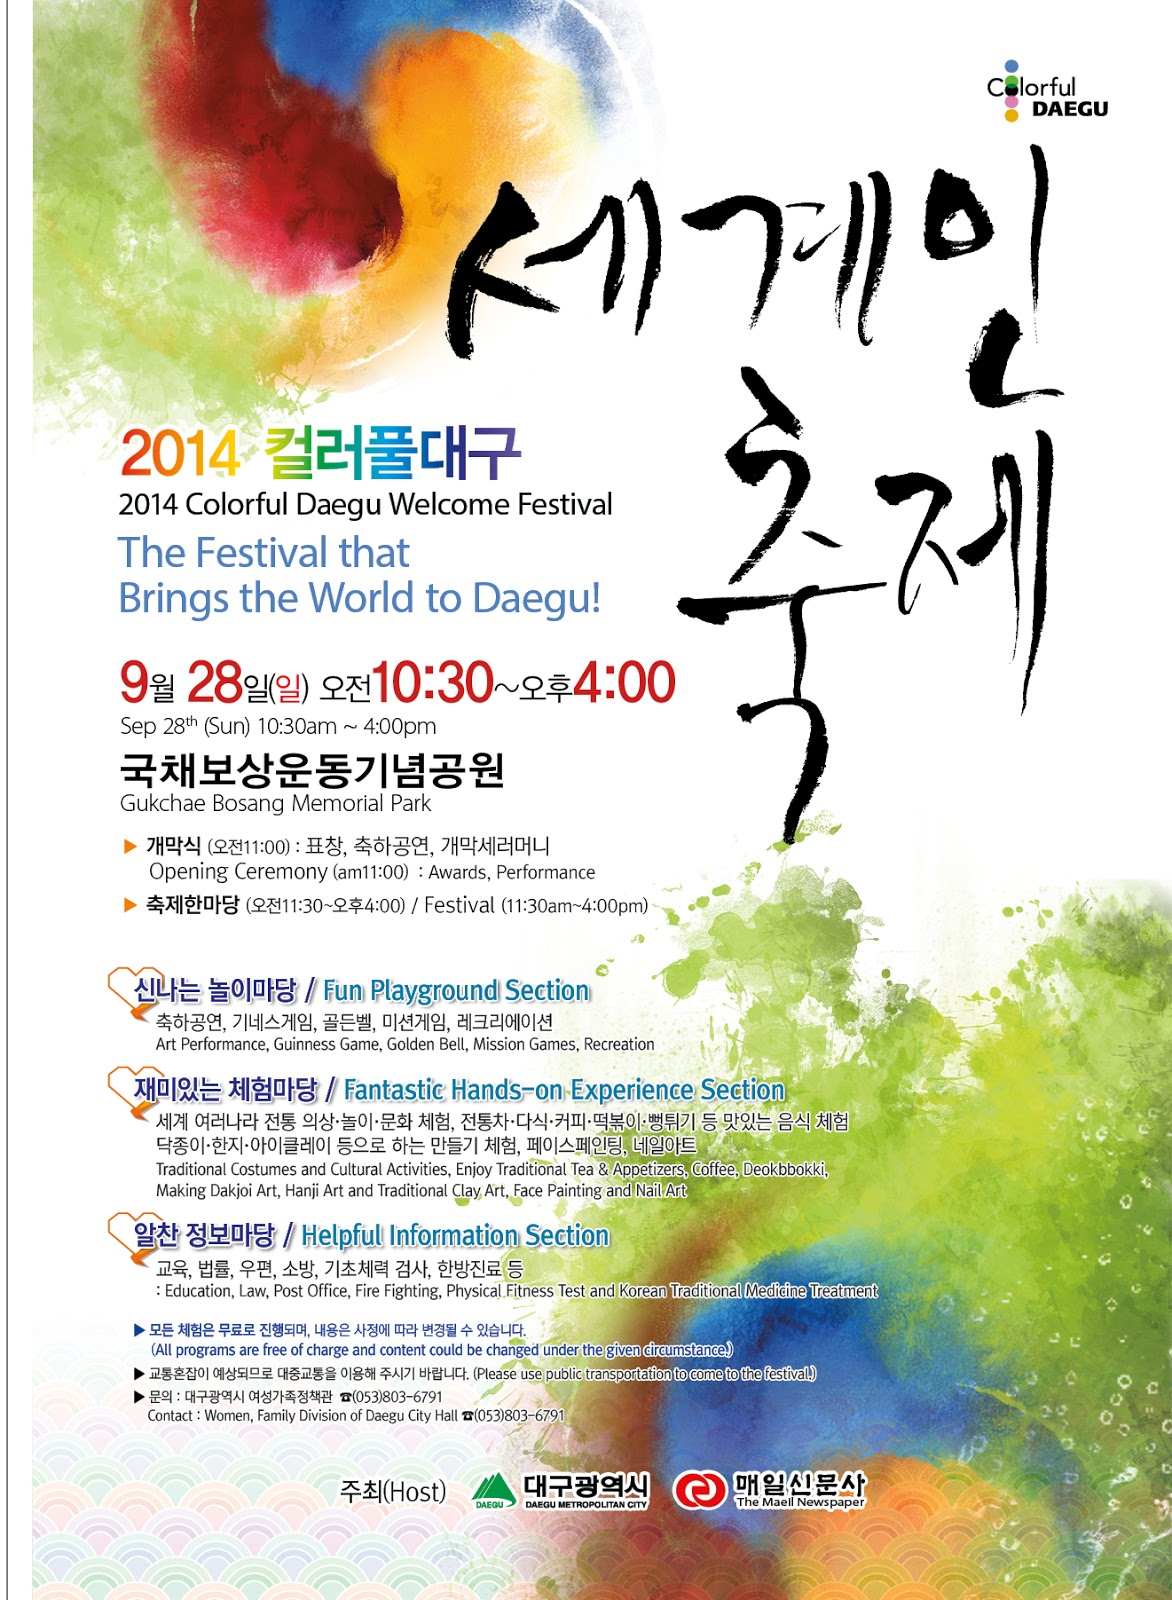 Colorful Daegu Global Festival